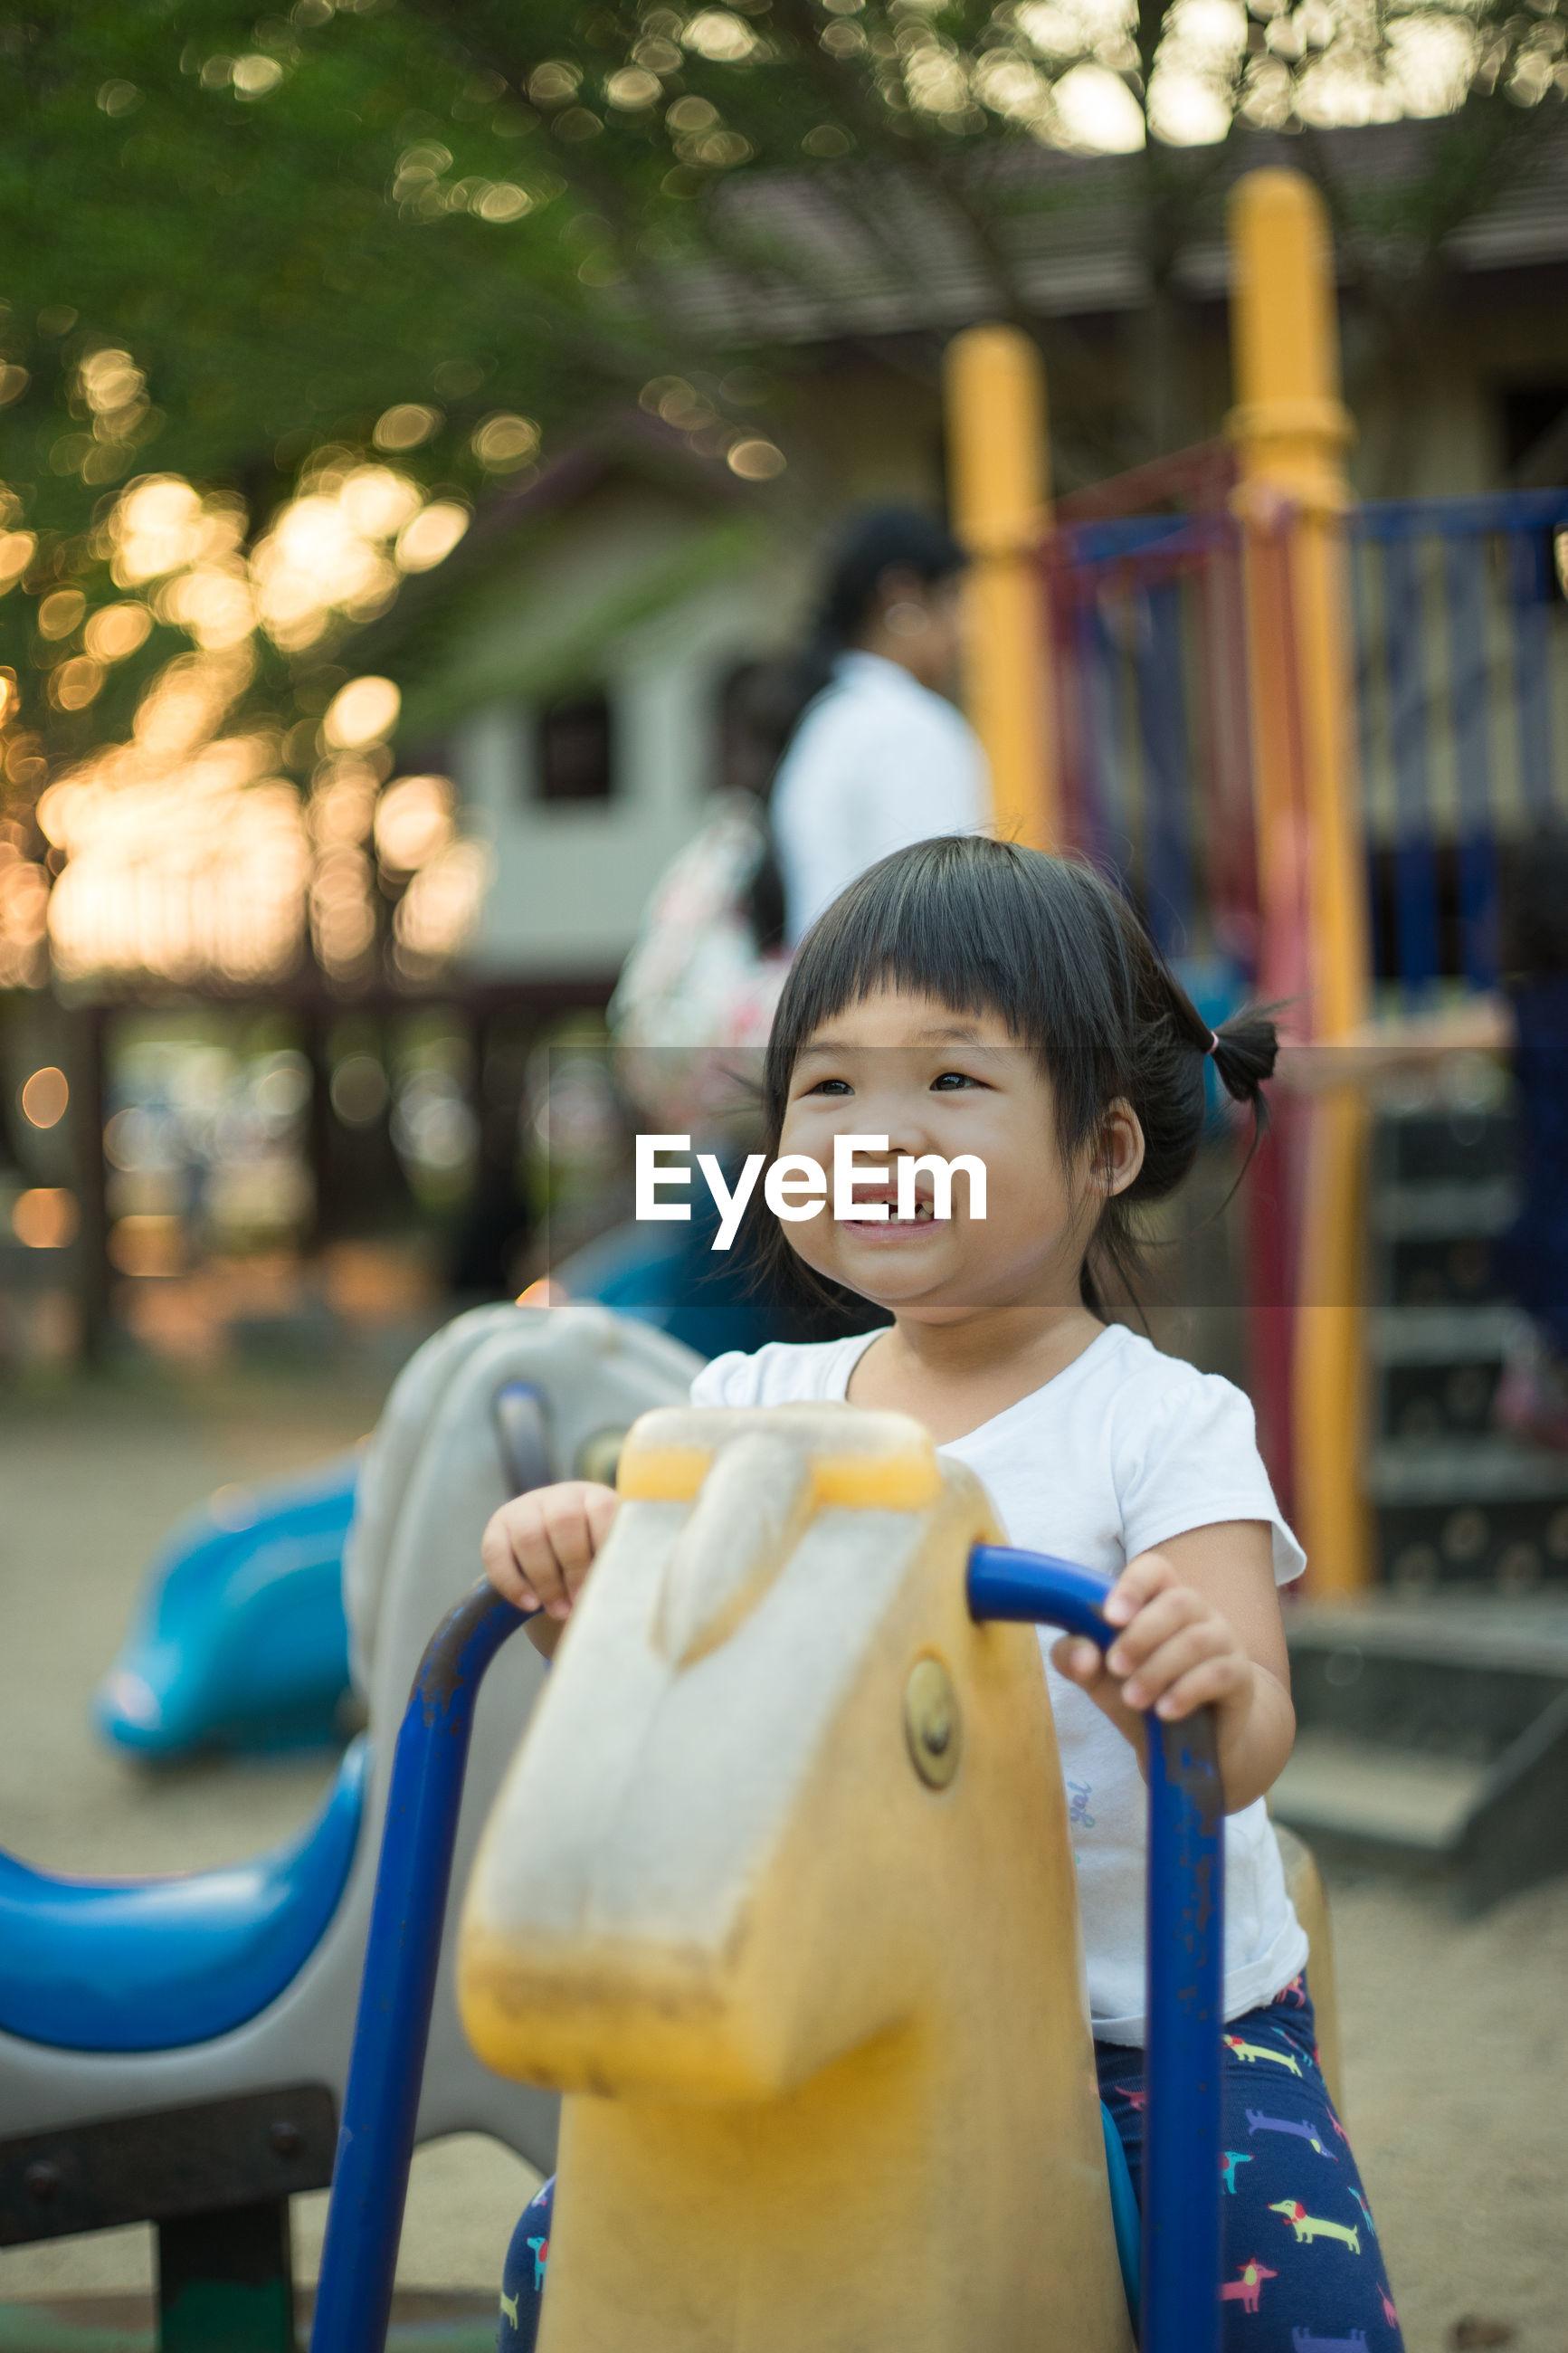 Cute girl playing at park